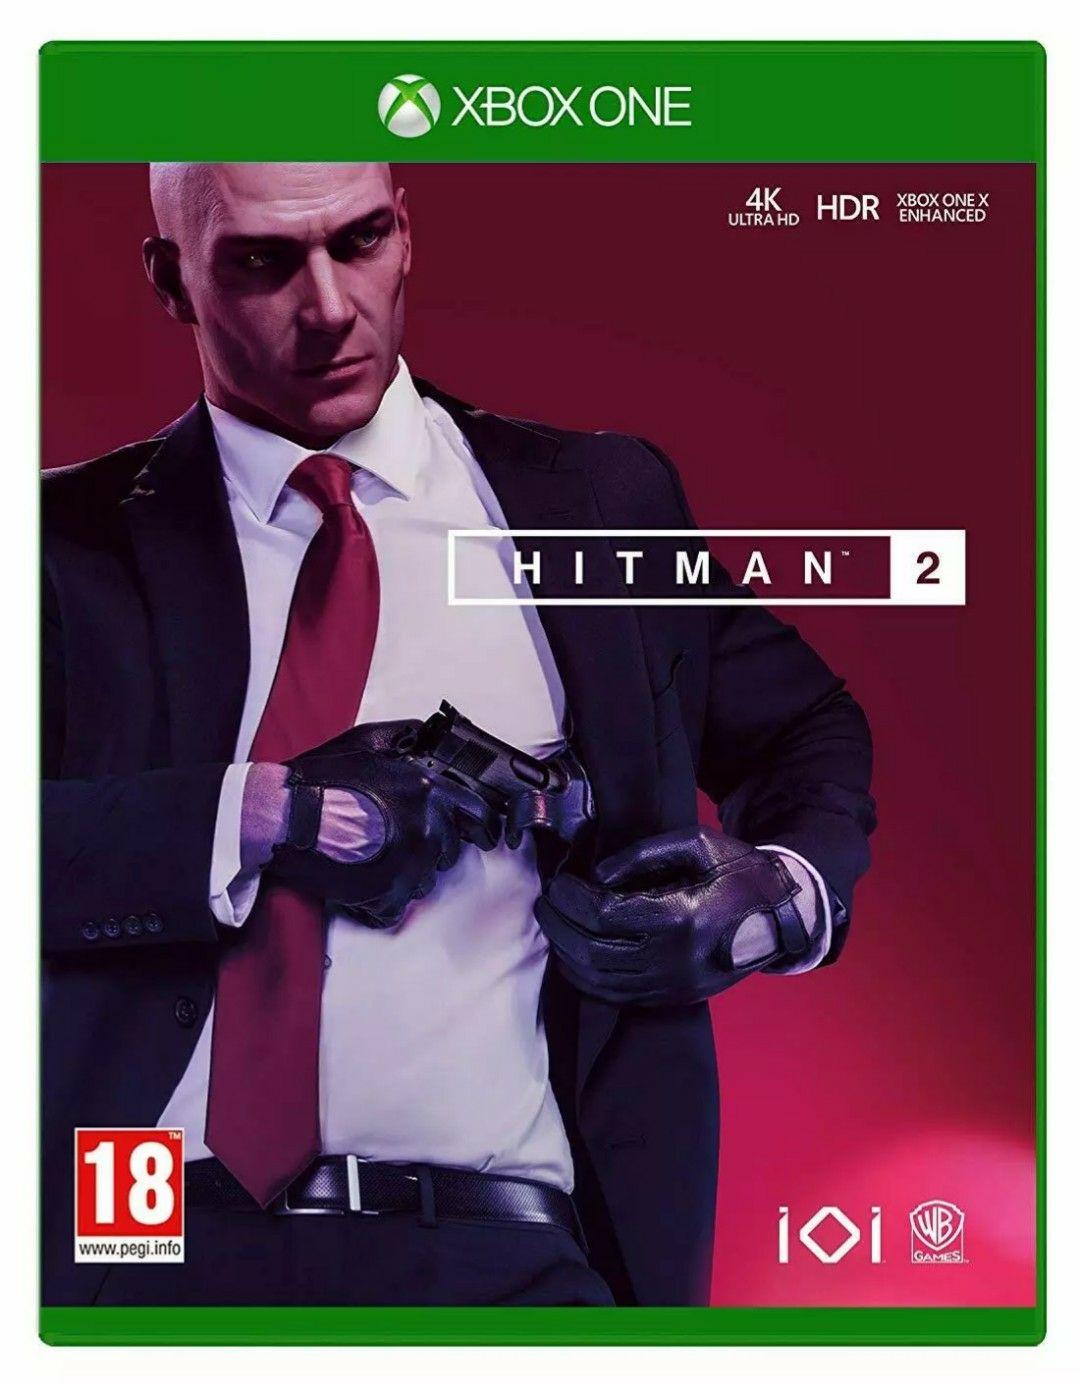 Used: Hitman 2 (Xbox One) £13.99 @ Ebay/Boomerang Rentals